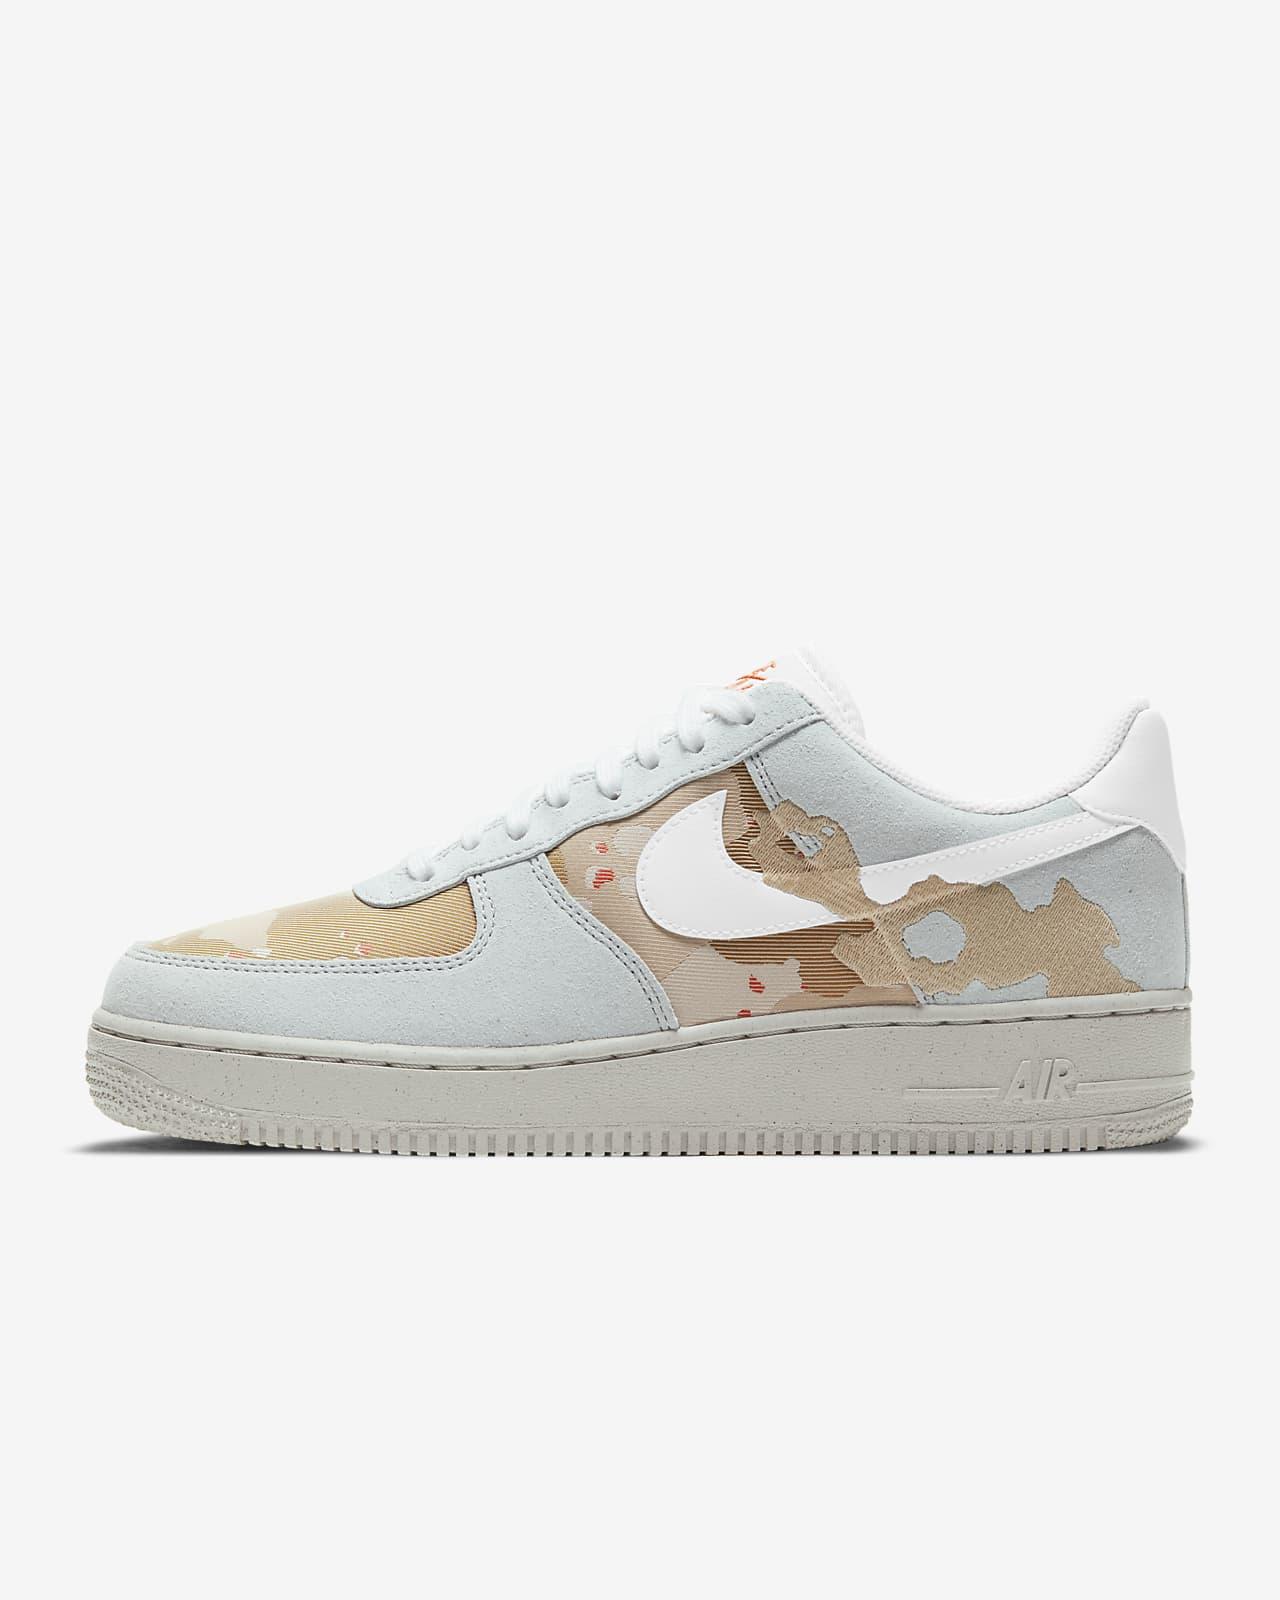 Nike Air Force 1 '07 LX Men's Shoe